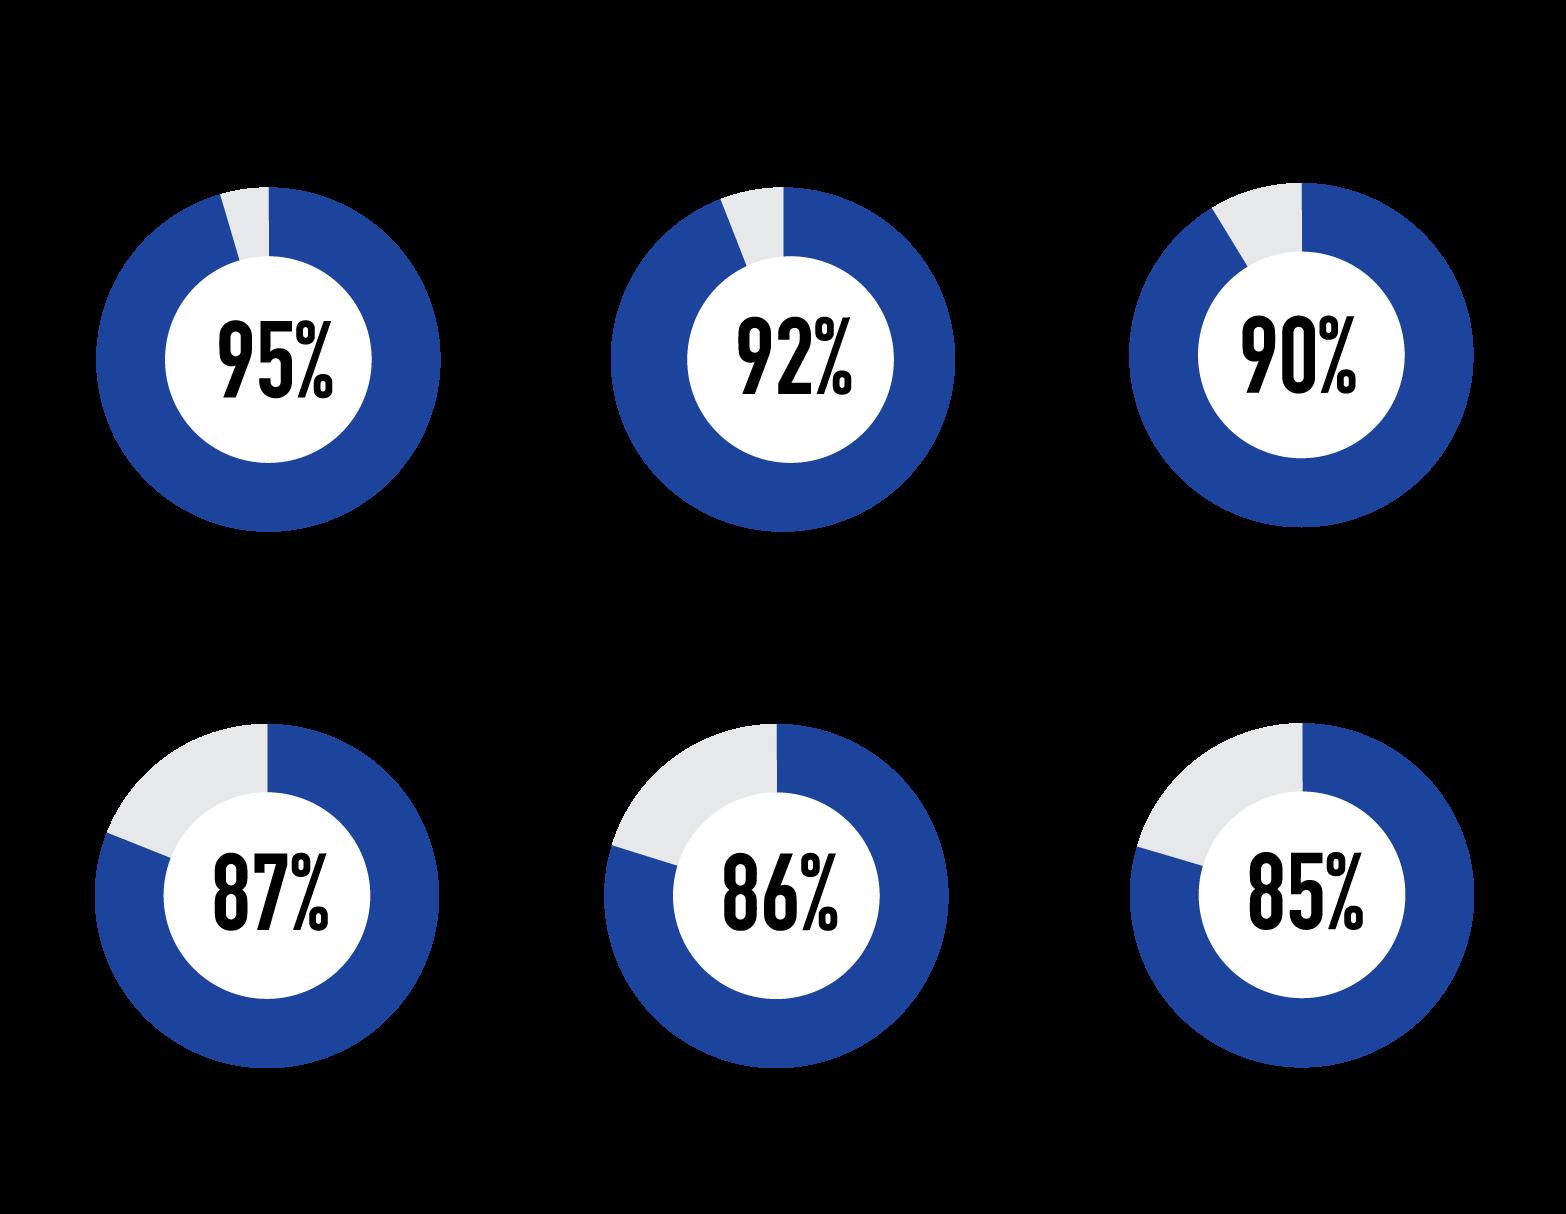 Client Satisfaction Rates: Results of 2014 Client Survey